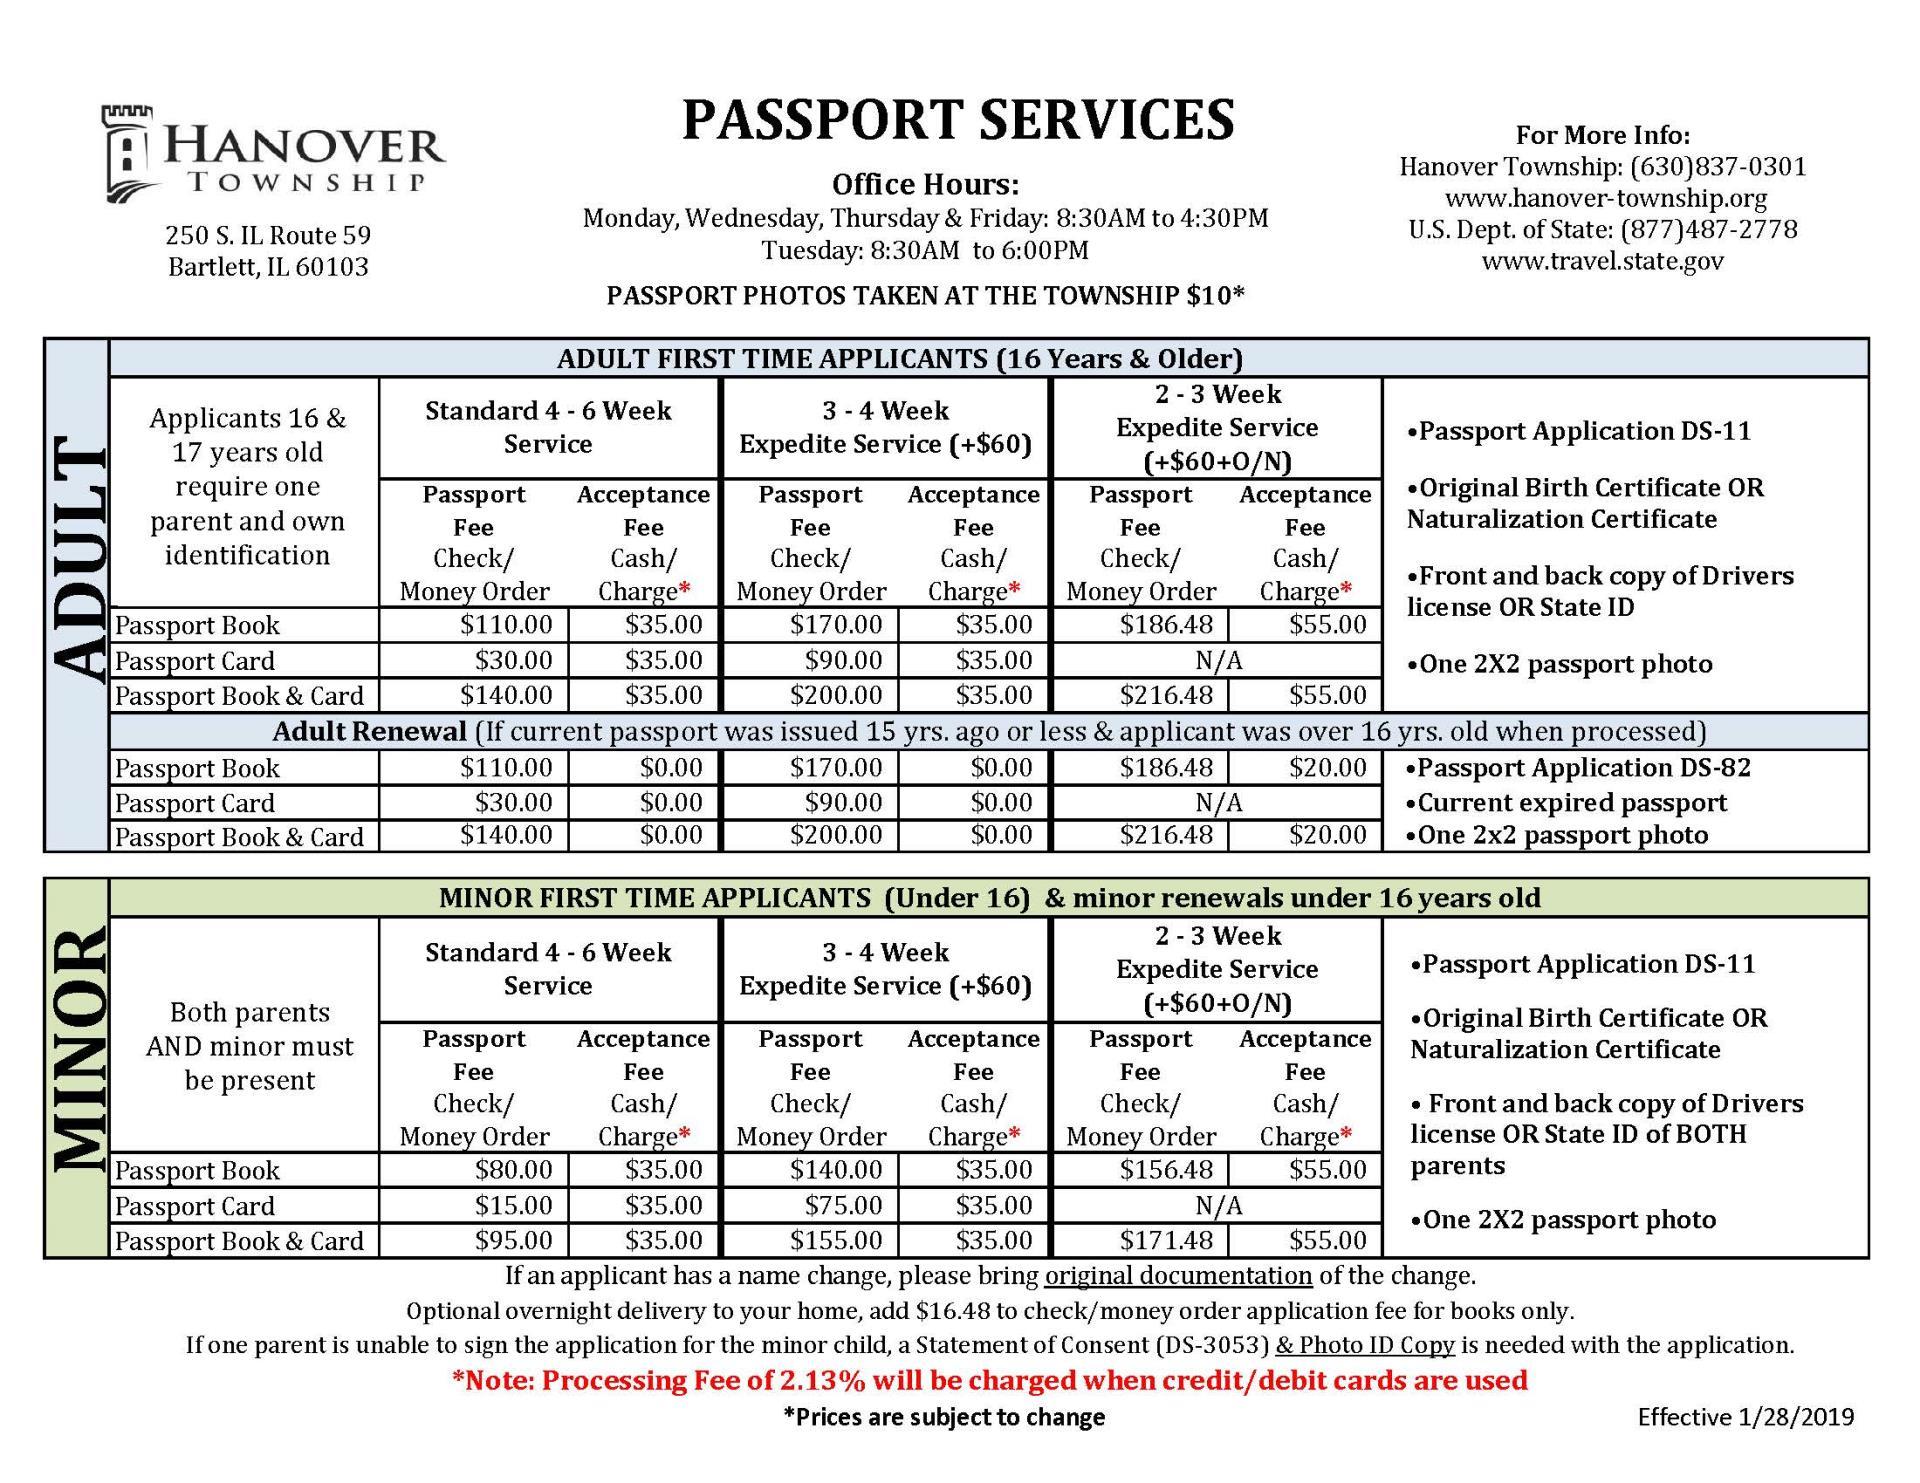 Passport Services At Hanover Township Hanover Township Il